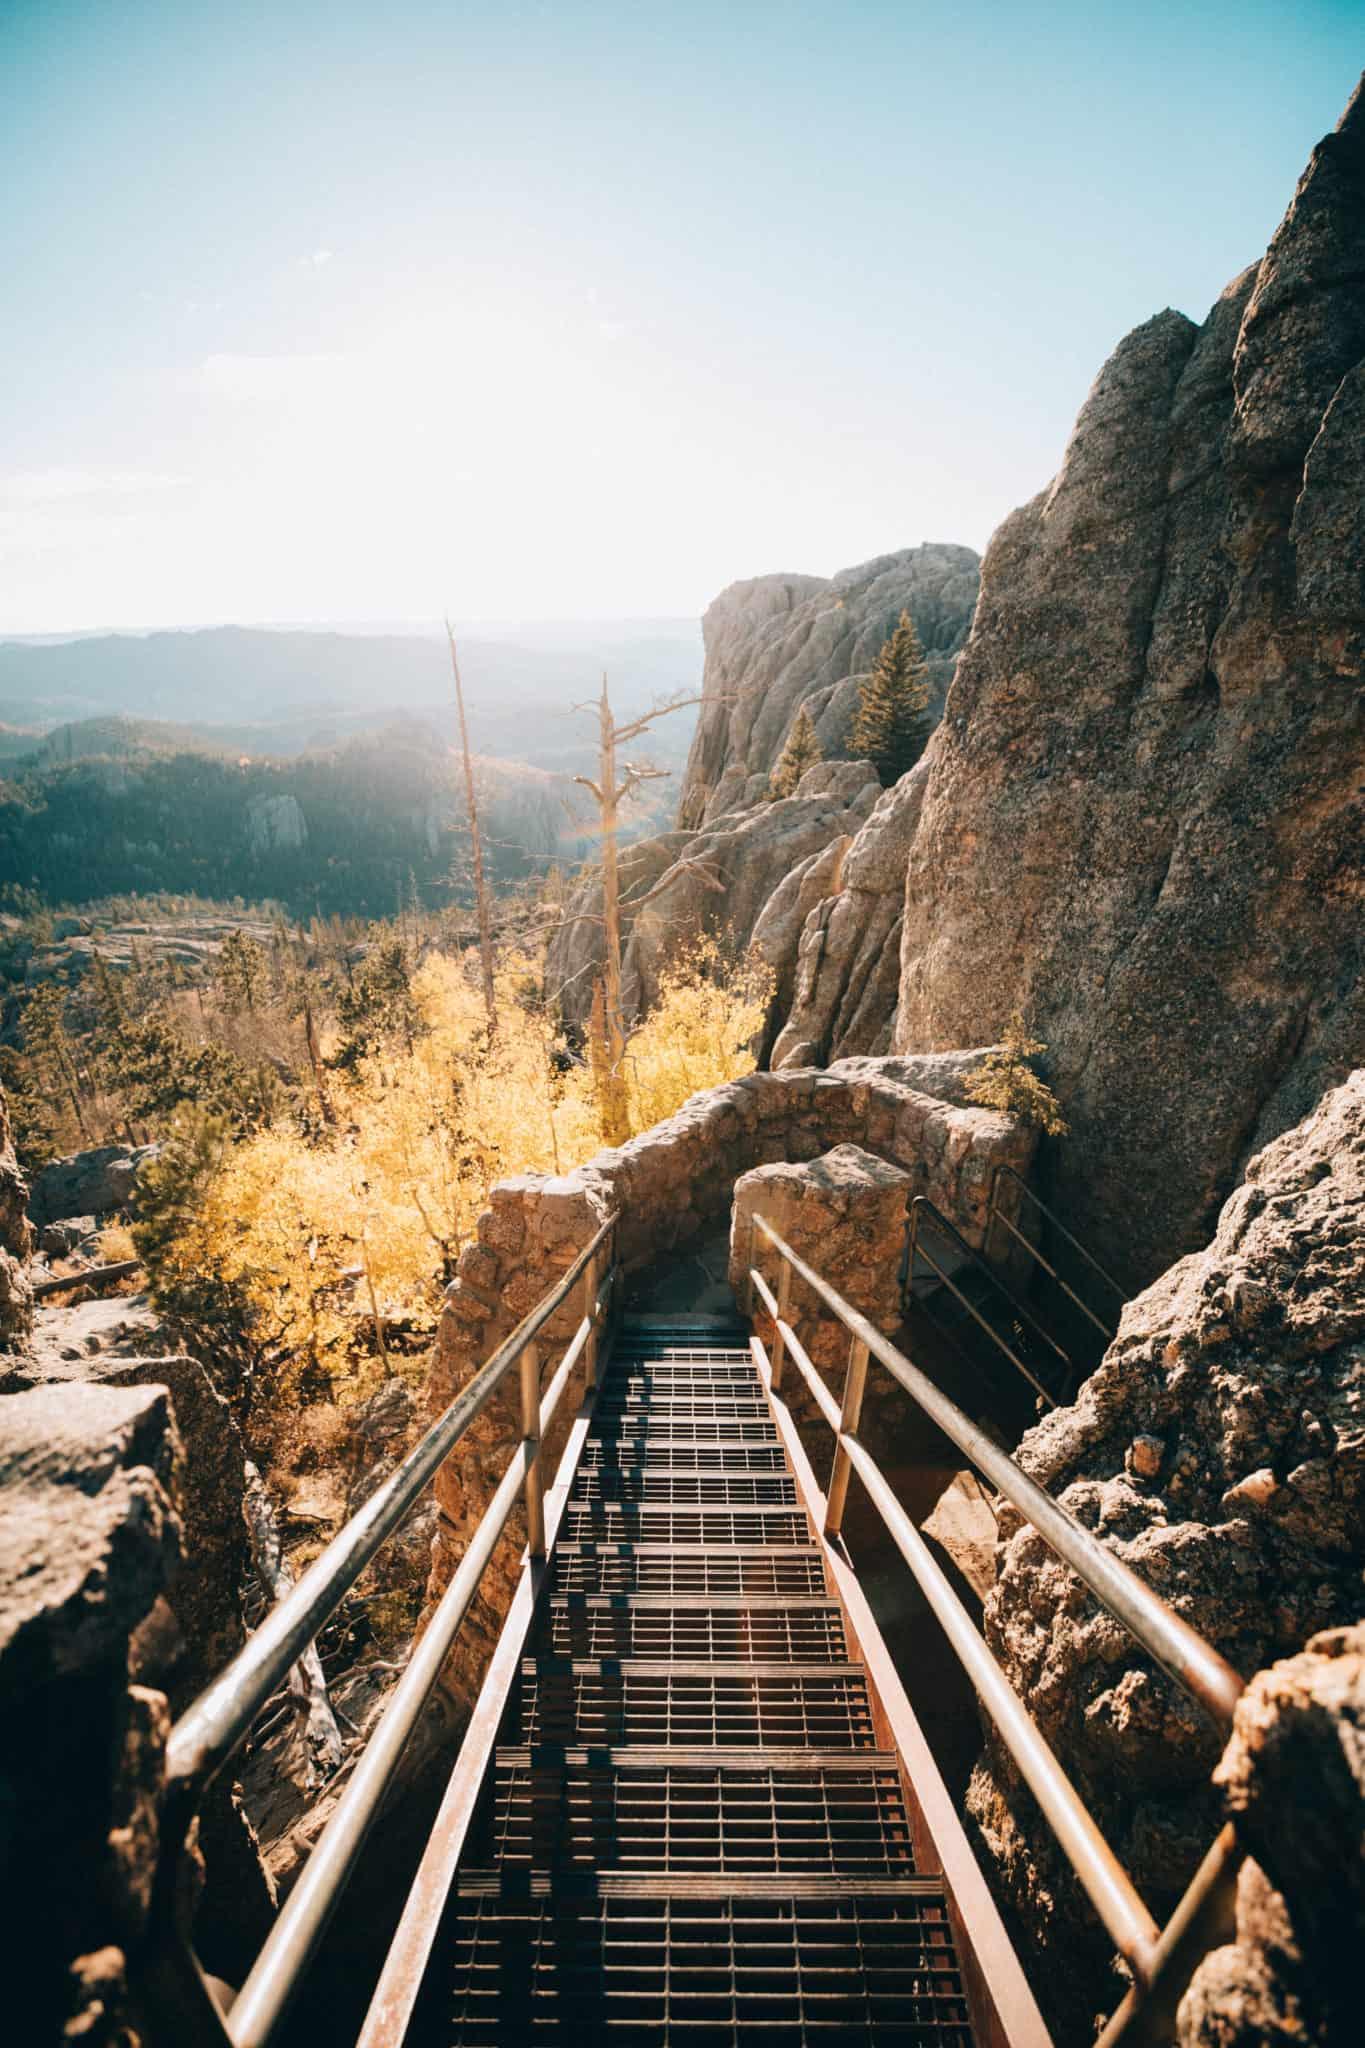 Fire Tower Stairs at Black Elk Peak Summit, South Dakota